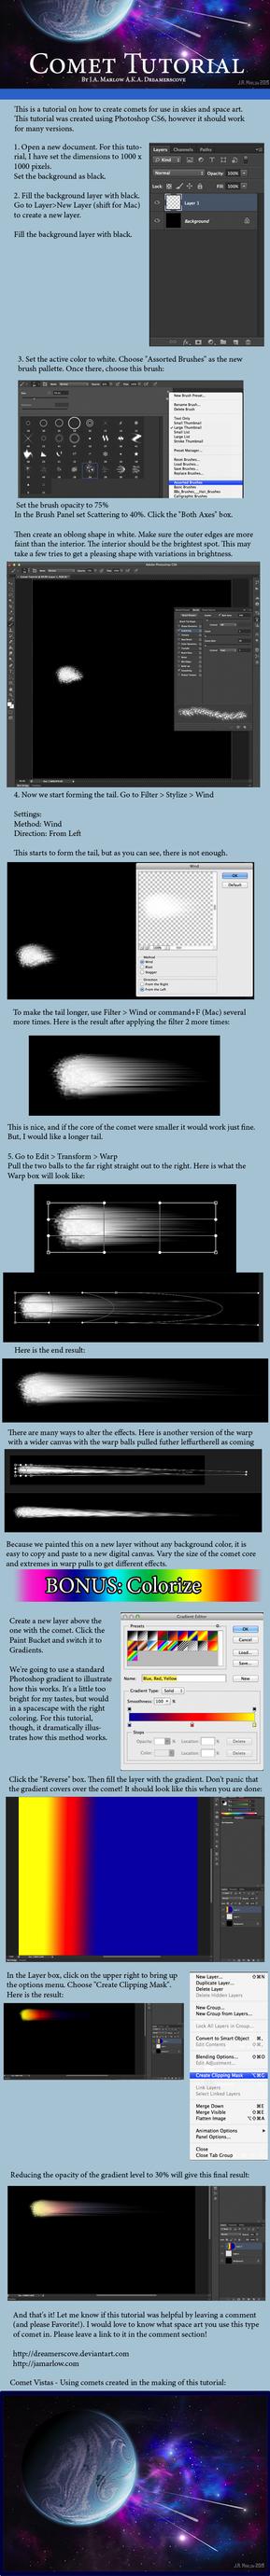 Comet Tutorial by JAMarlow